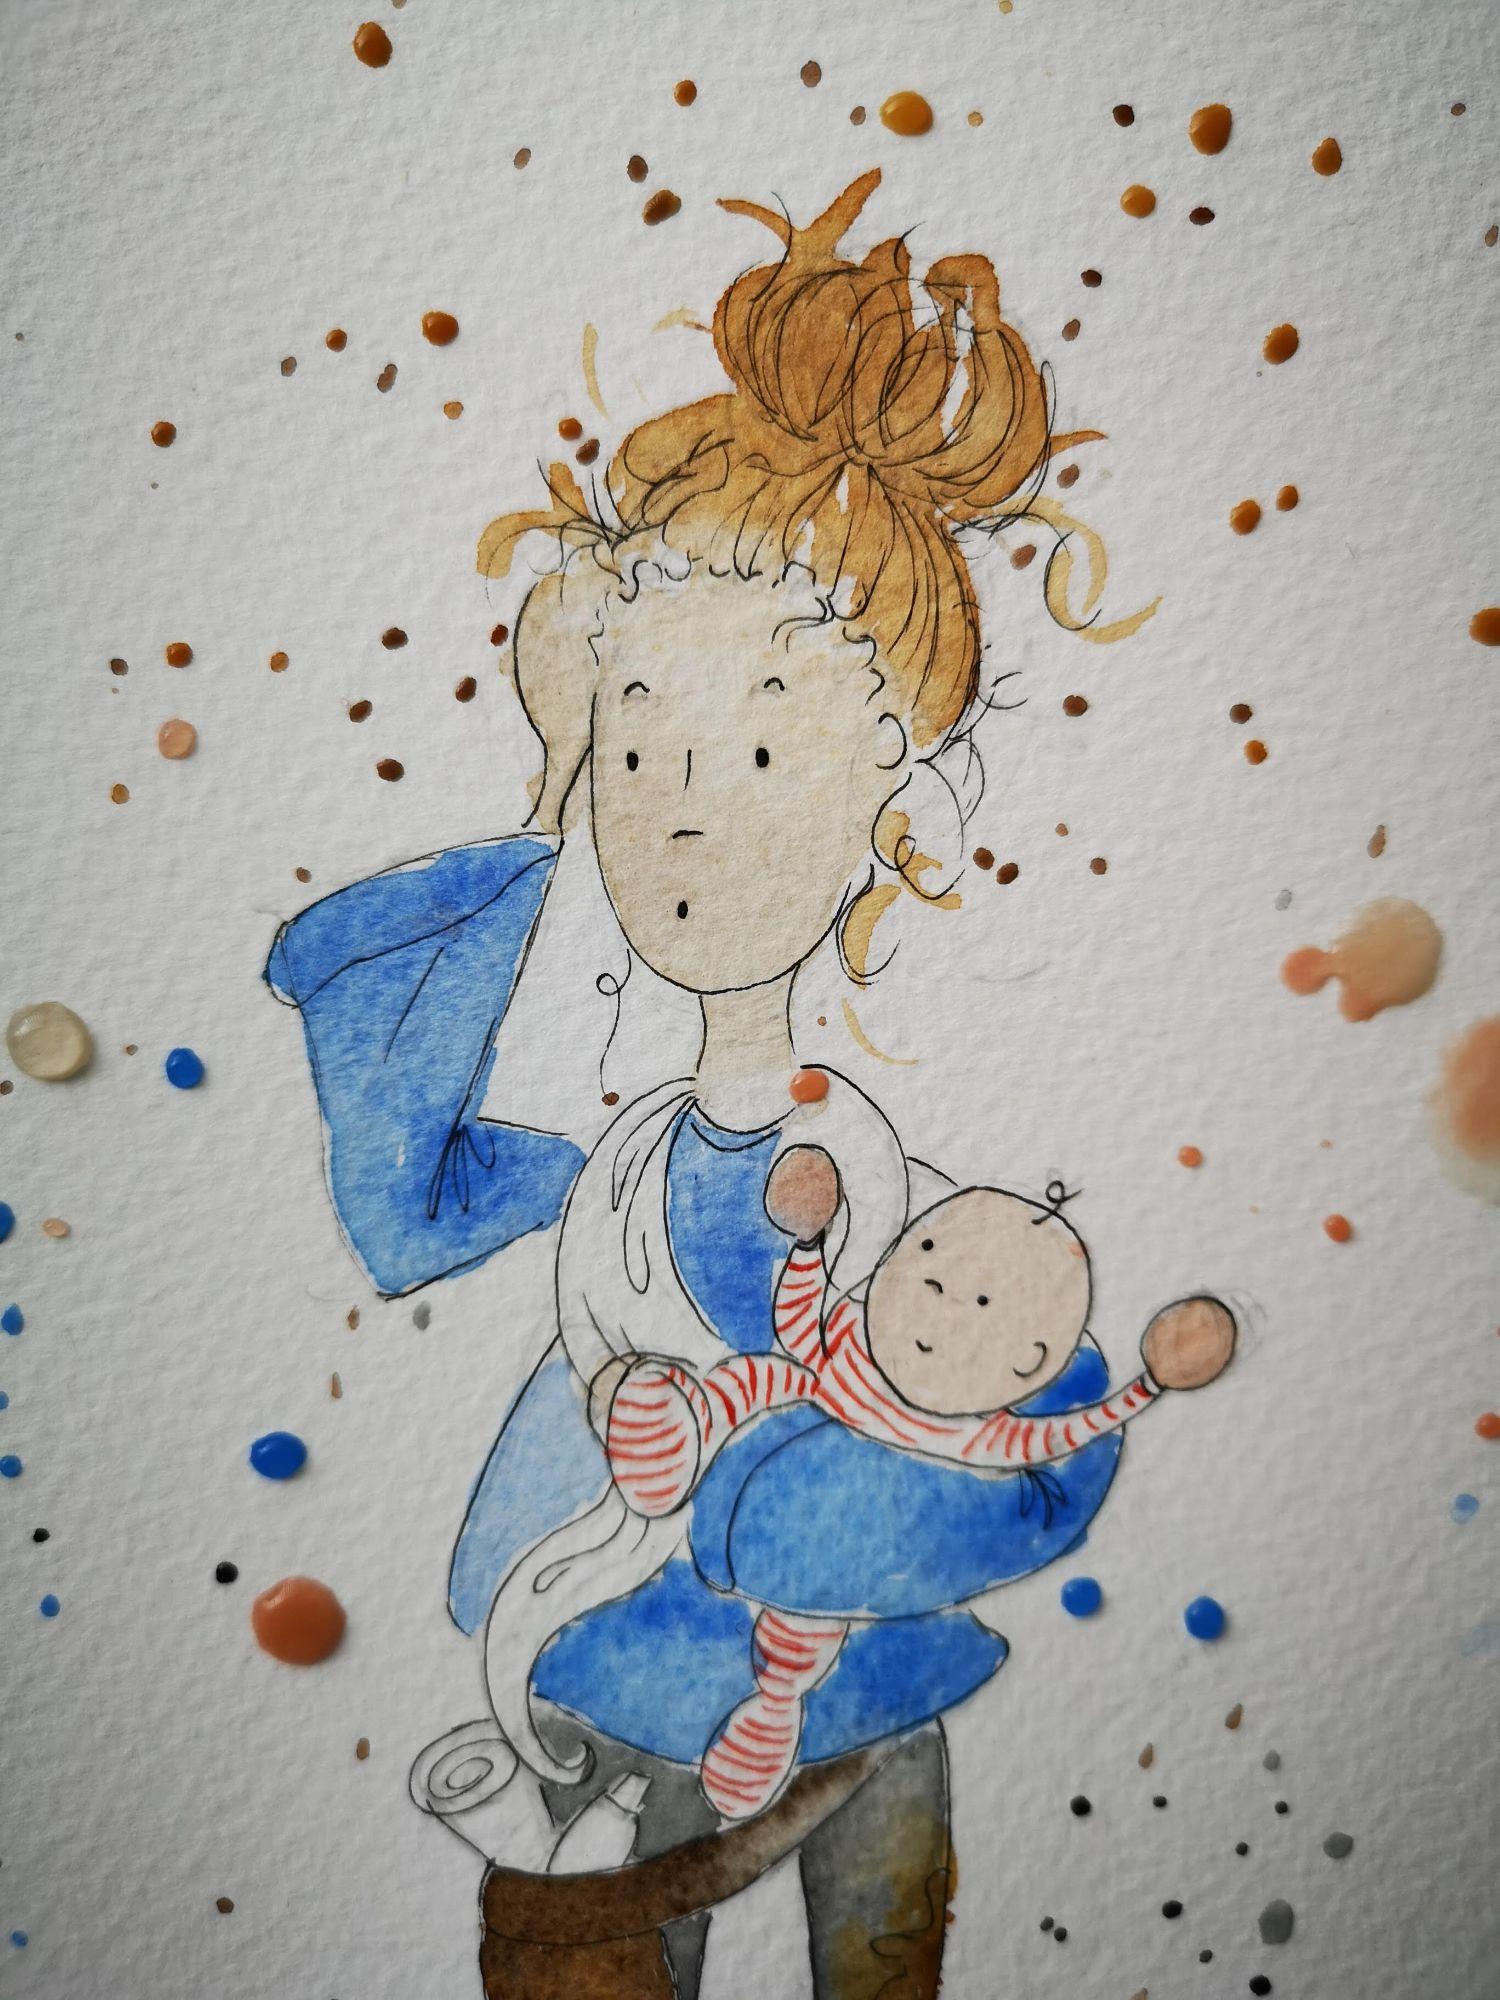 childrens book illustrator north east.jpg